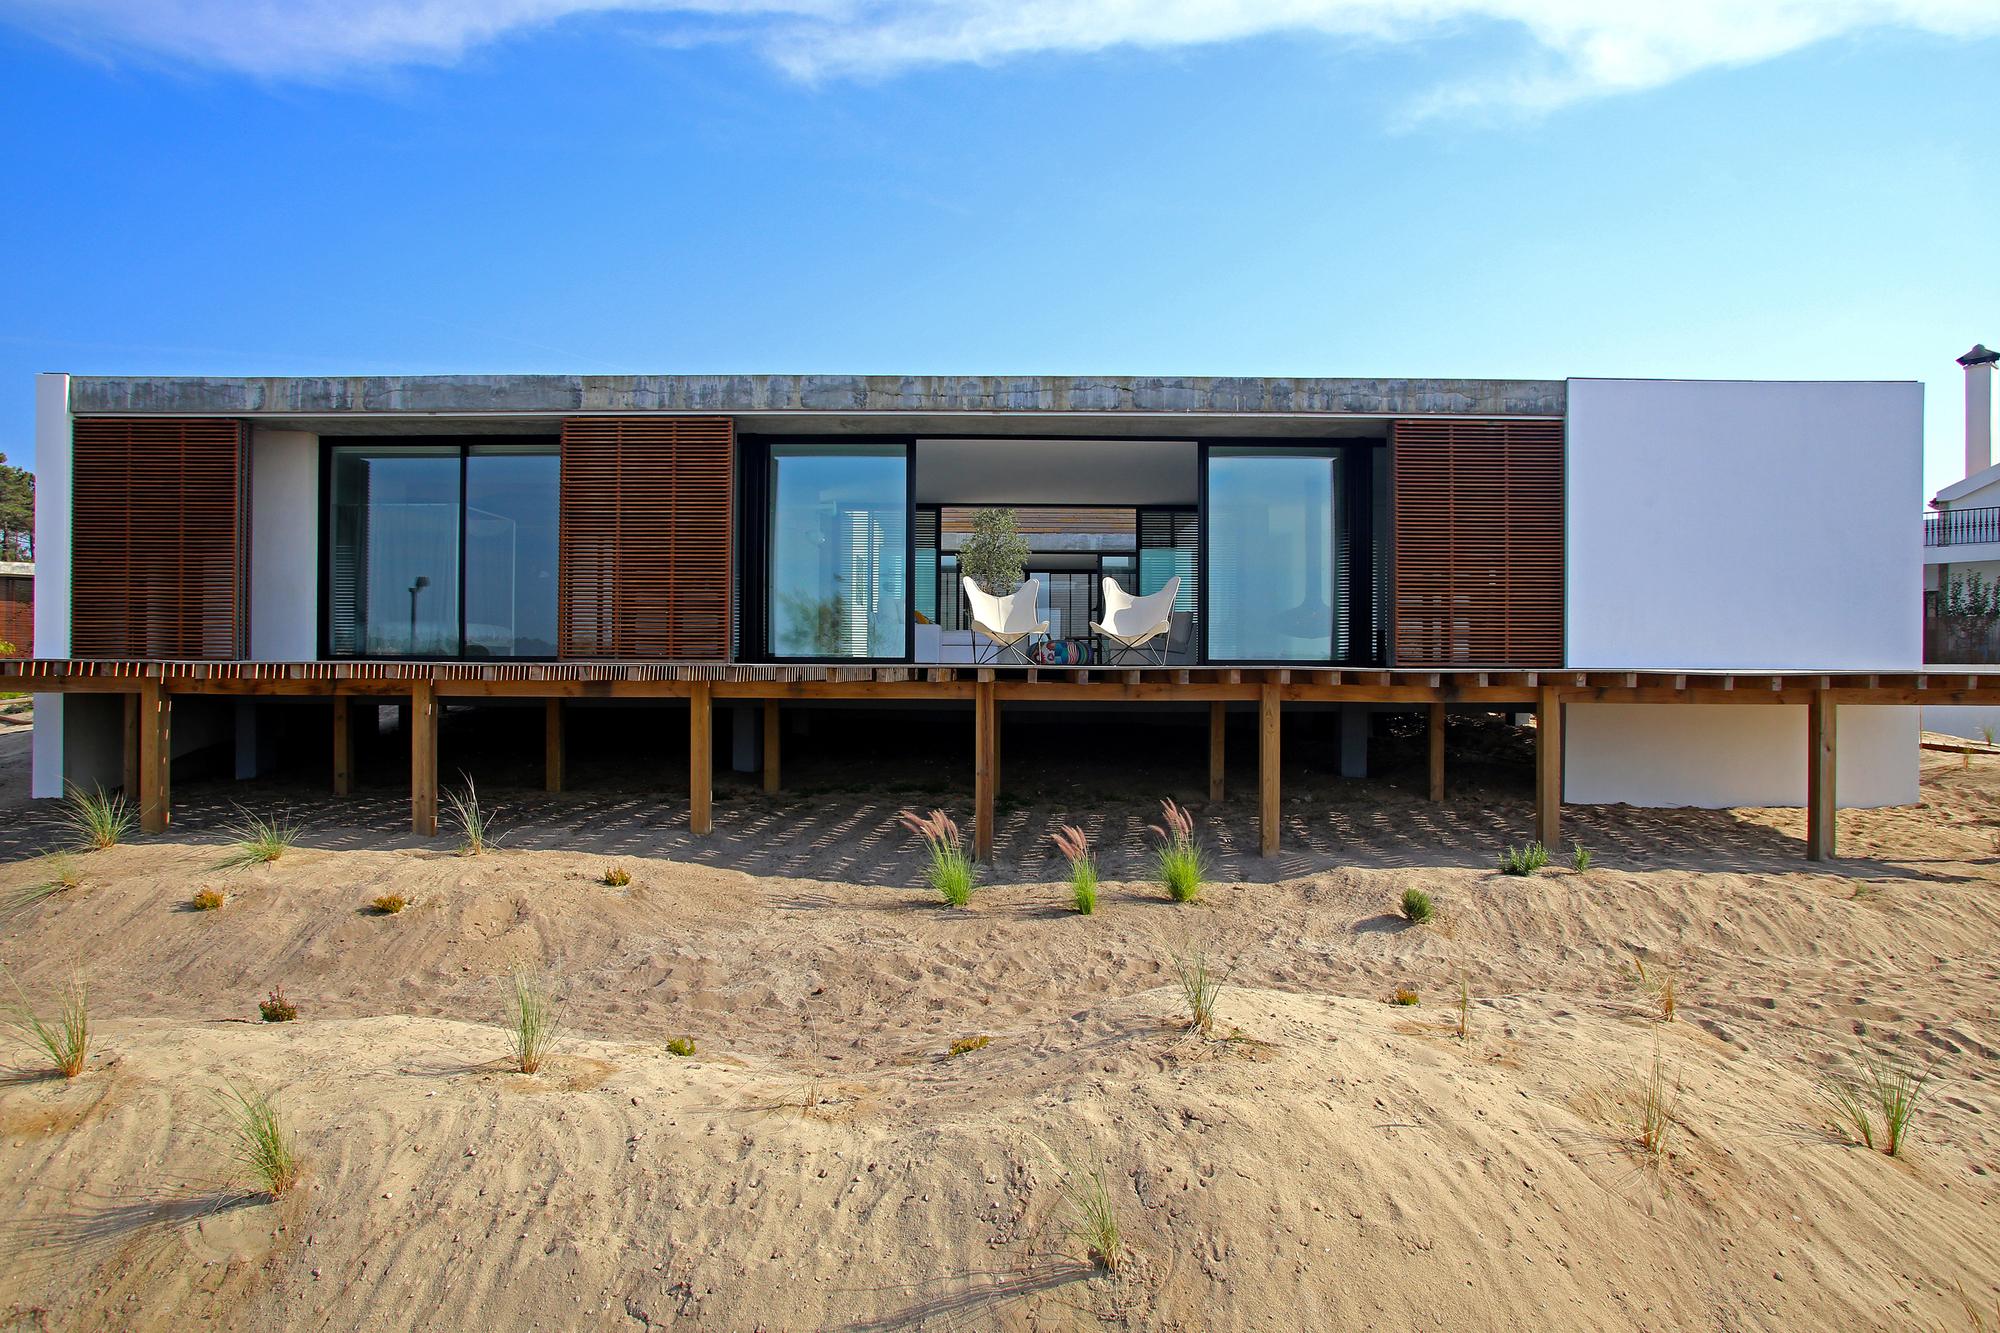 Modern architecture & interior design #4 - Casa do Pego by Pedro Ferreira Pinto